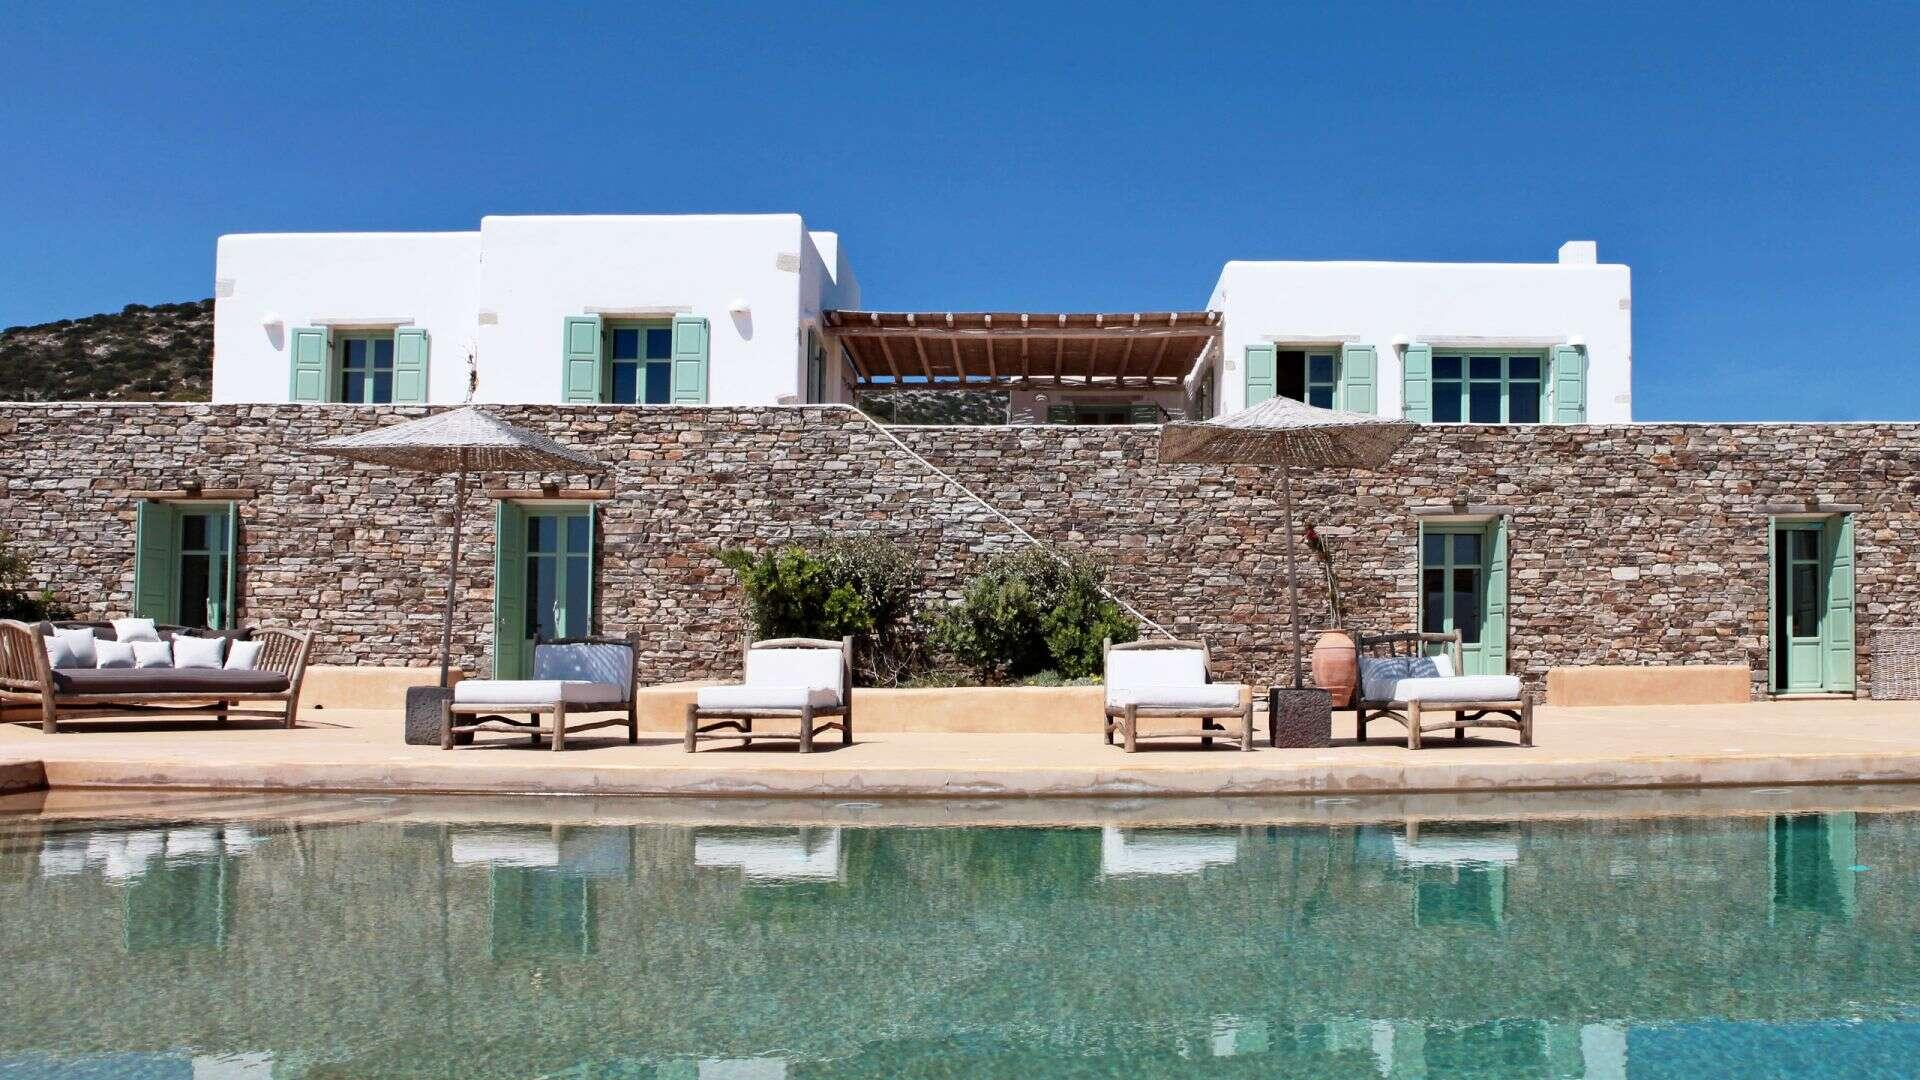 Luxury vacation rentals europe - Greece - Antiparos - Magganies - Beechtree - Image 1/11